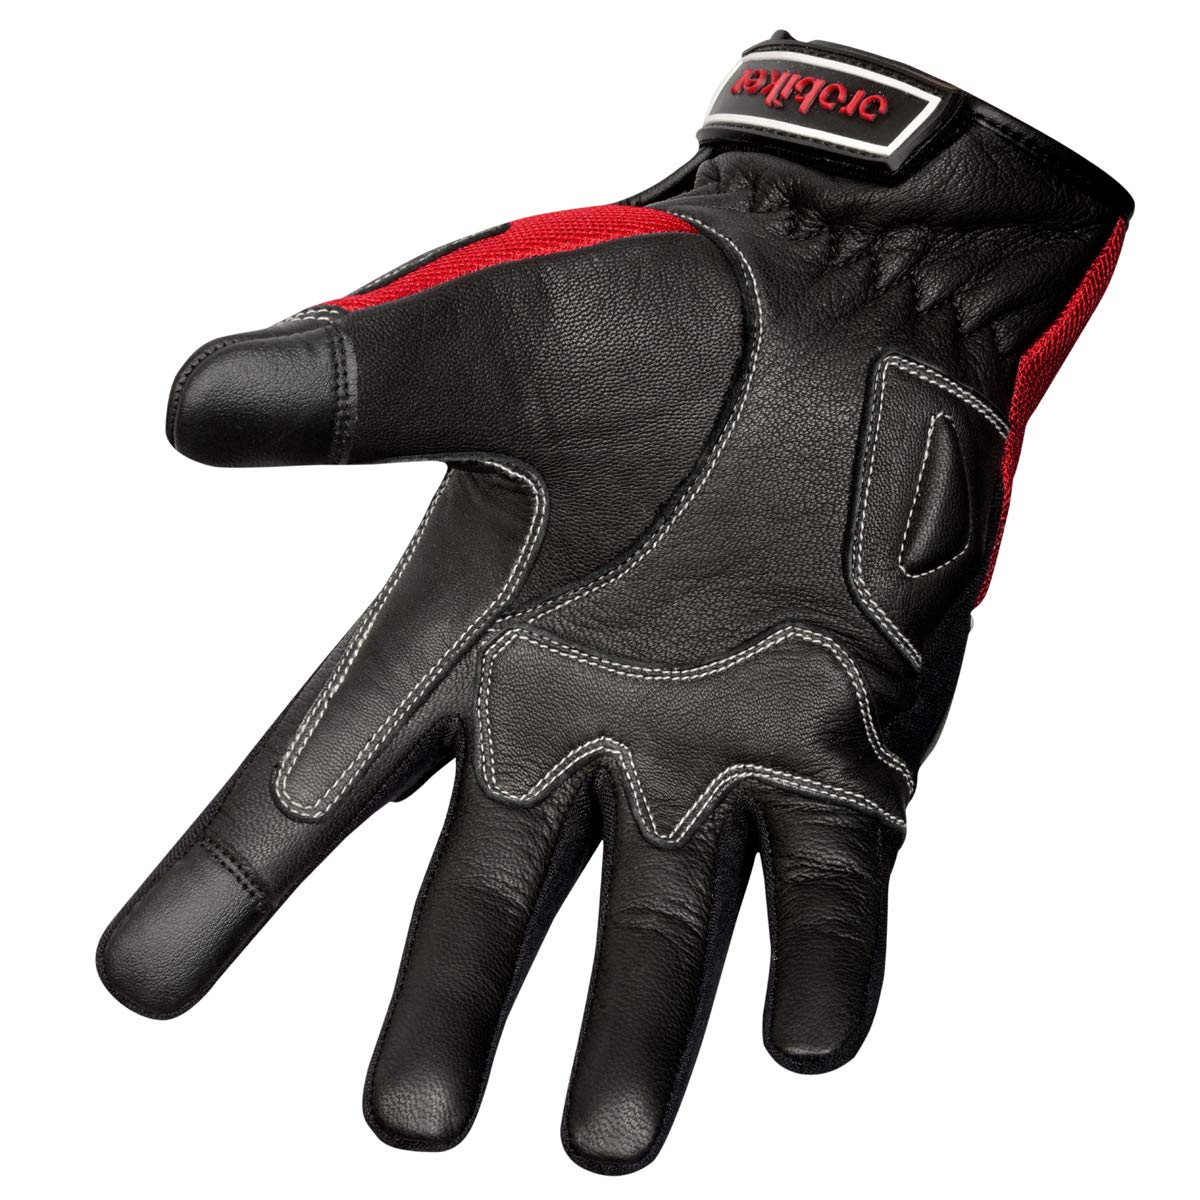 Oro Biker Motorbike Motorcycle Gloves Medium, Full Black Premium Leather and Summer Mesh Hard Knuckle Touch Screen Motorbike Gloves Racing ATV Riding Gloves for Men